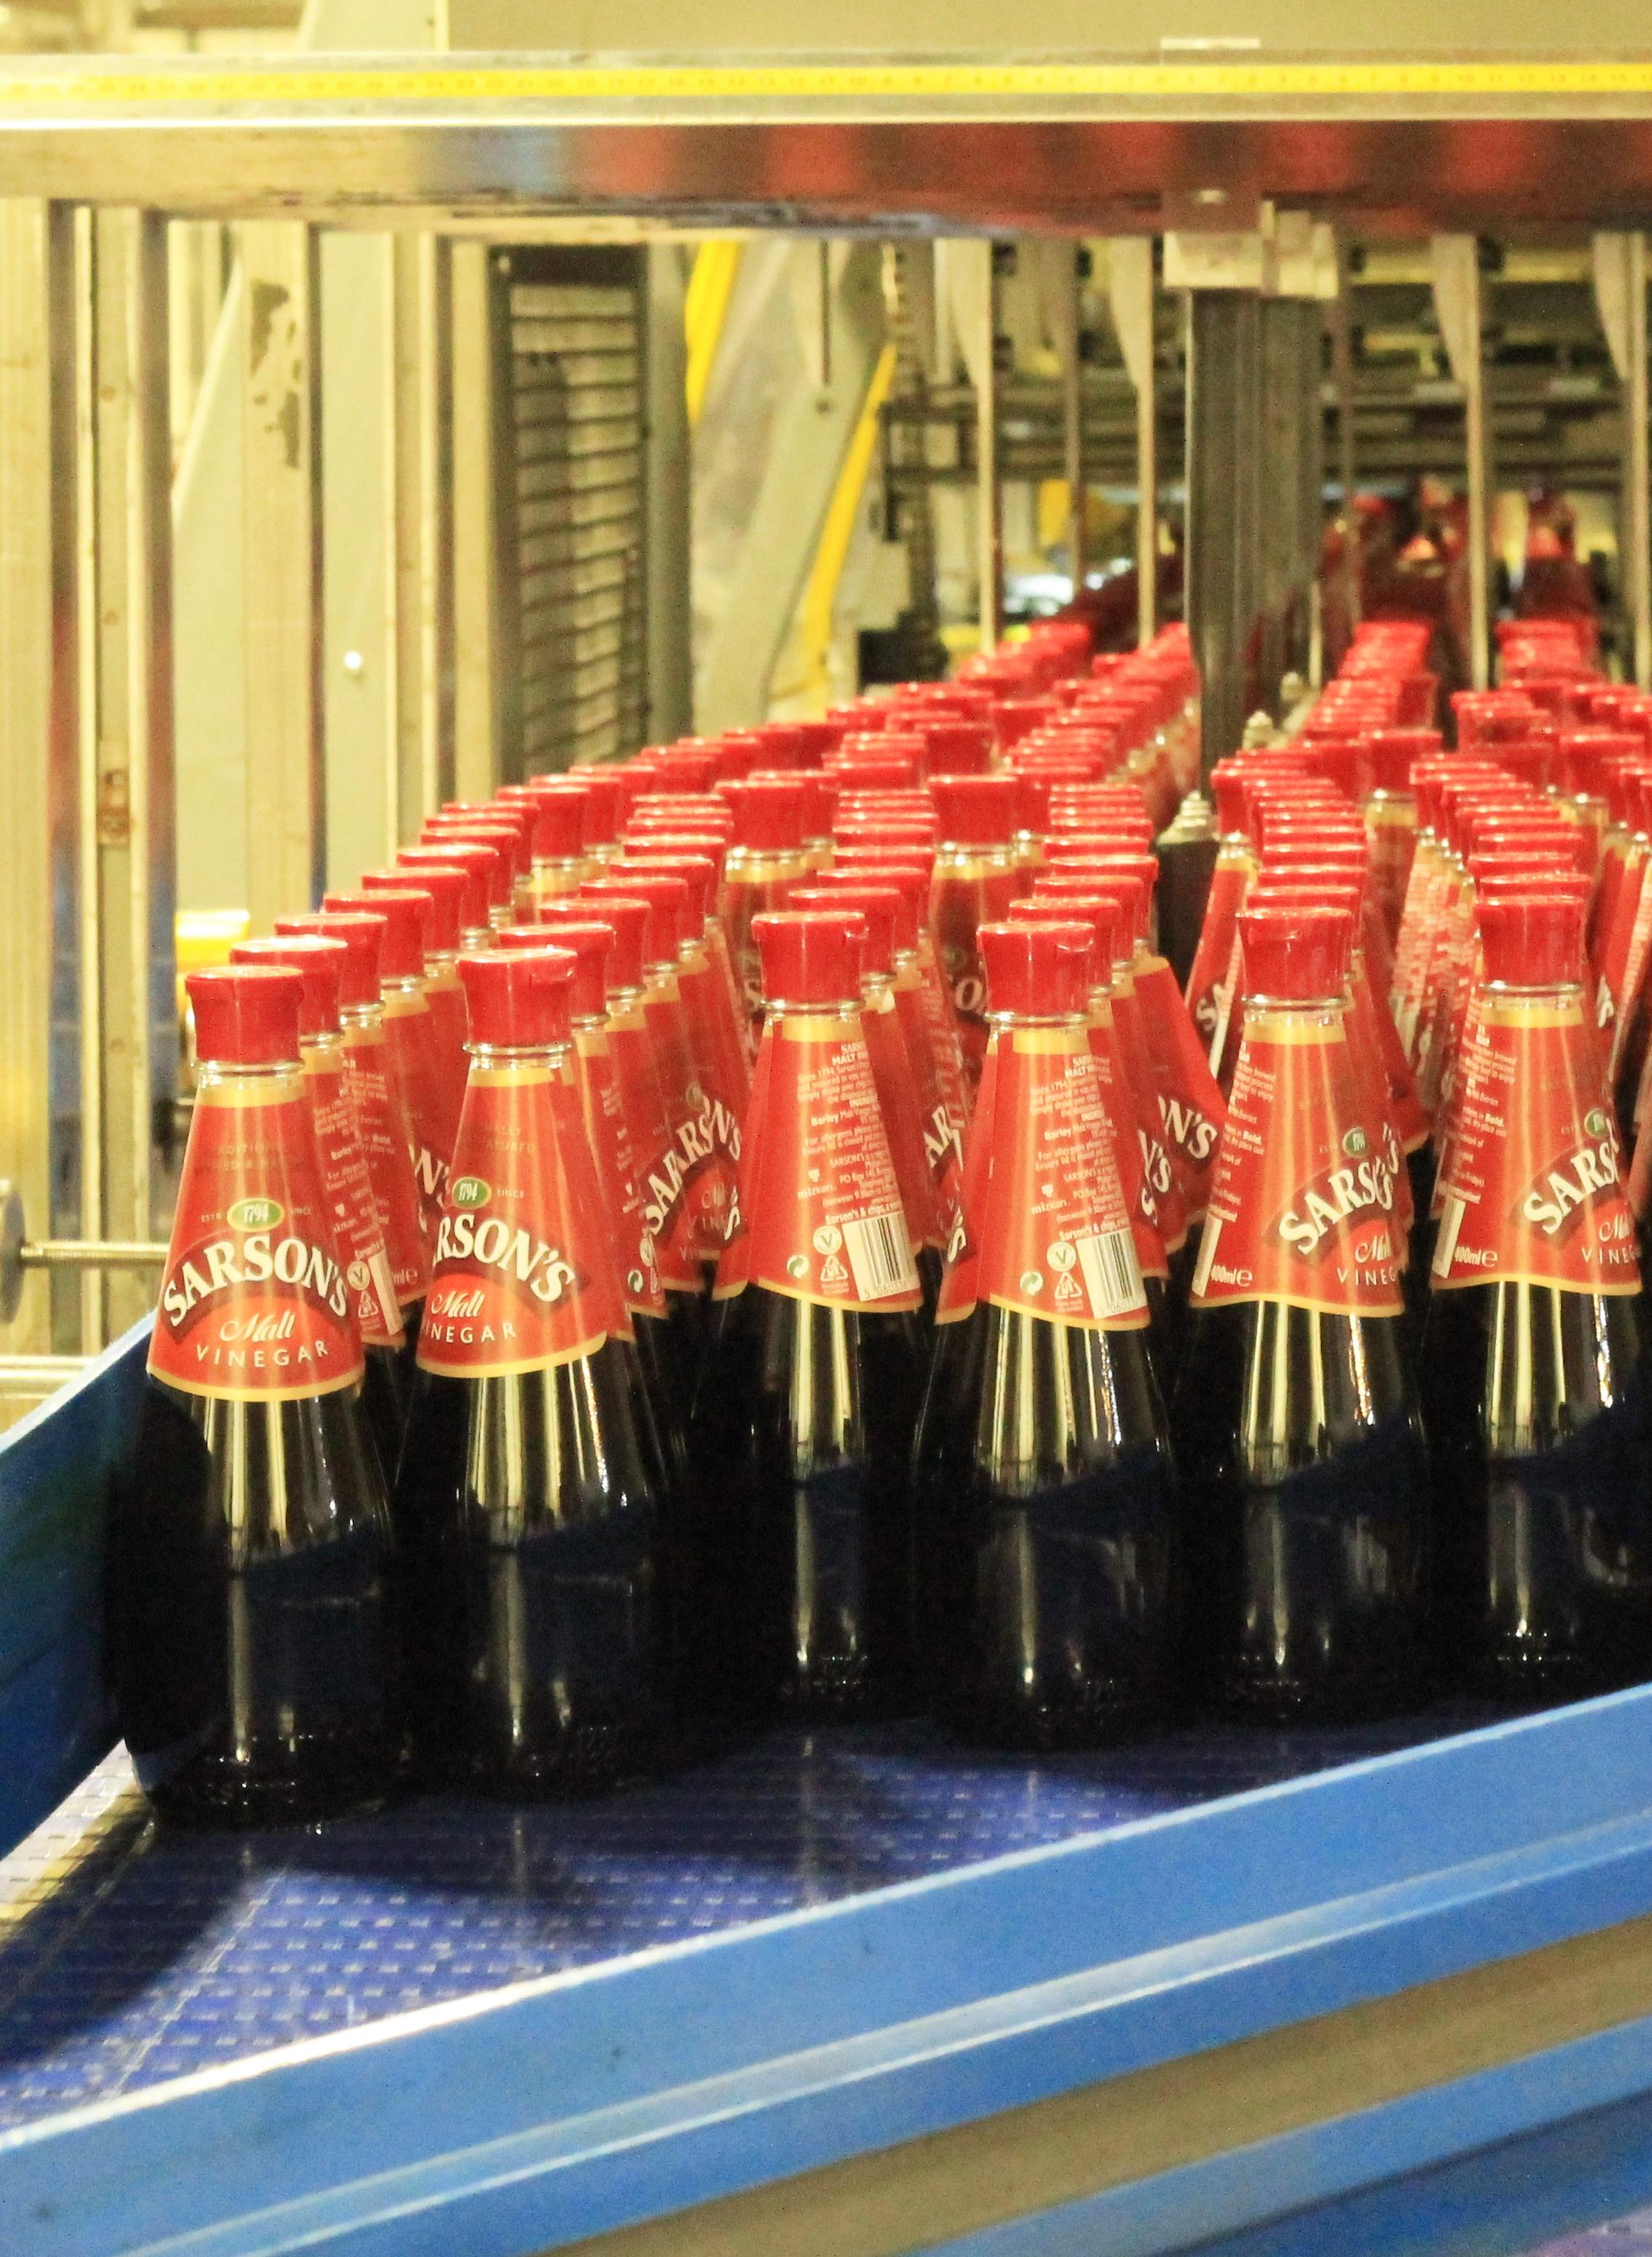 sarson's bottles